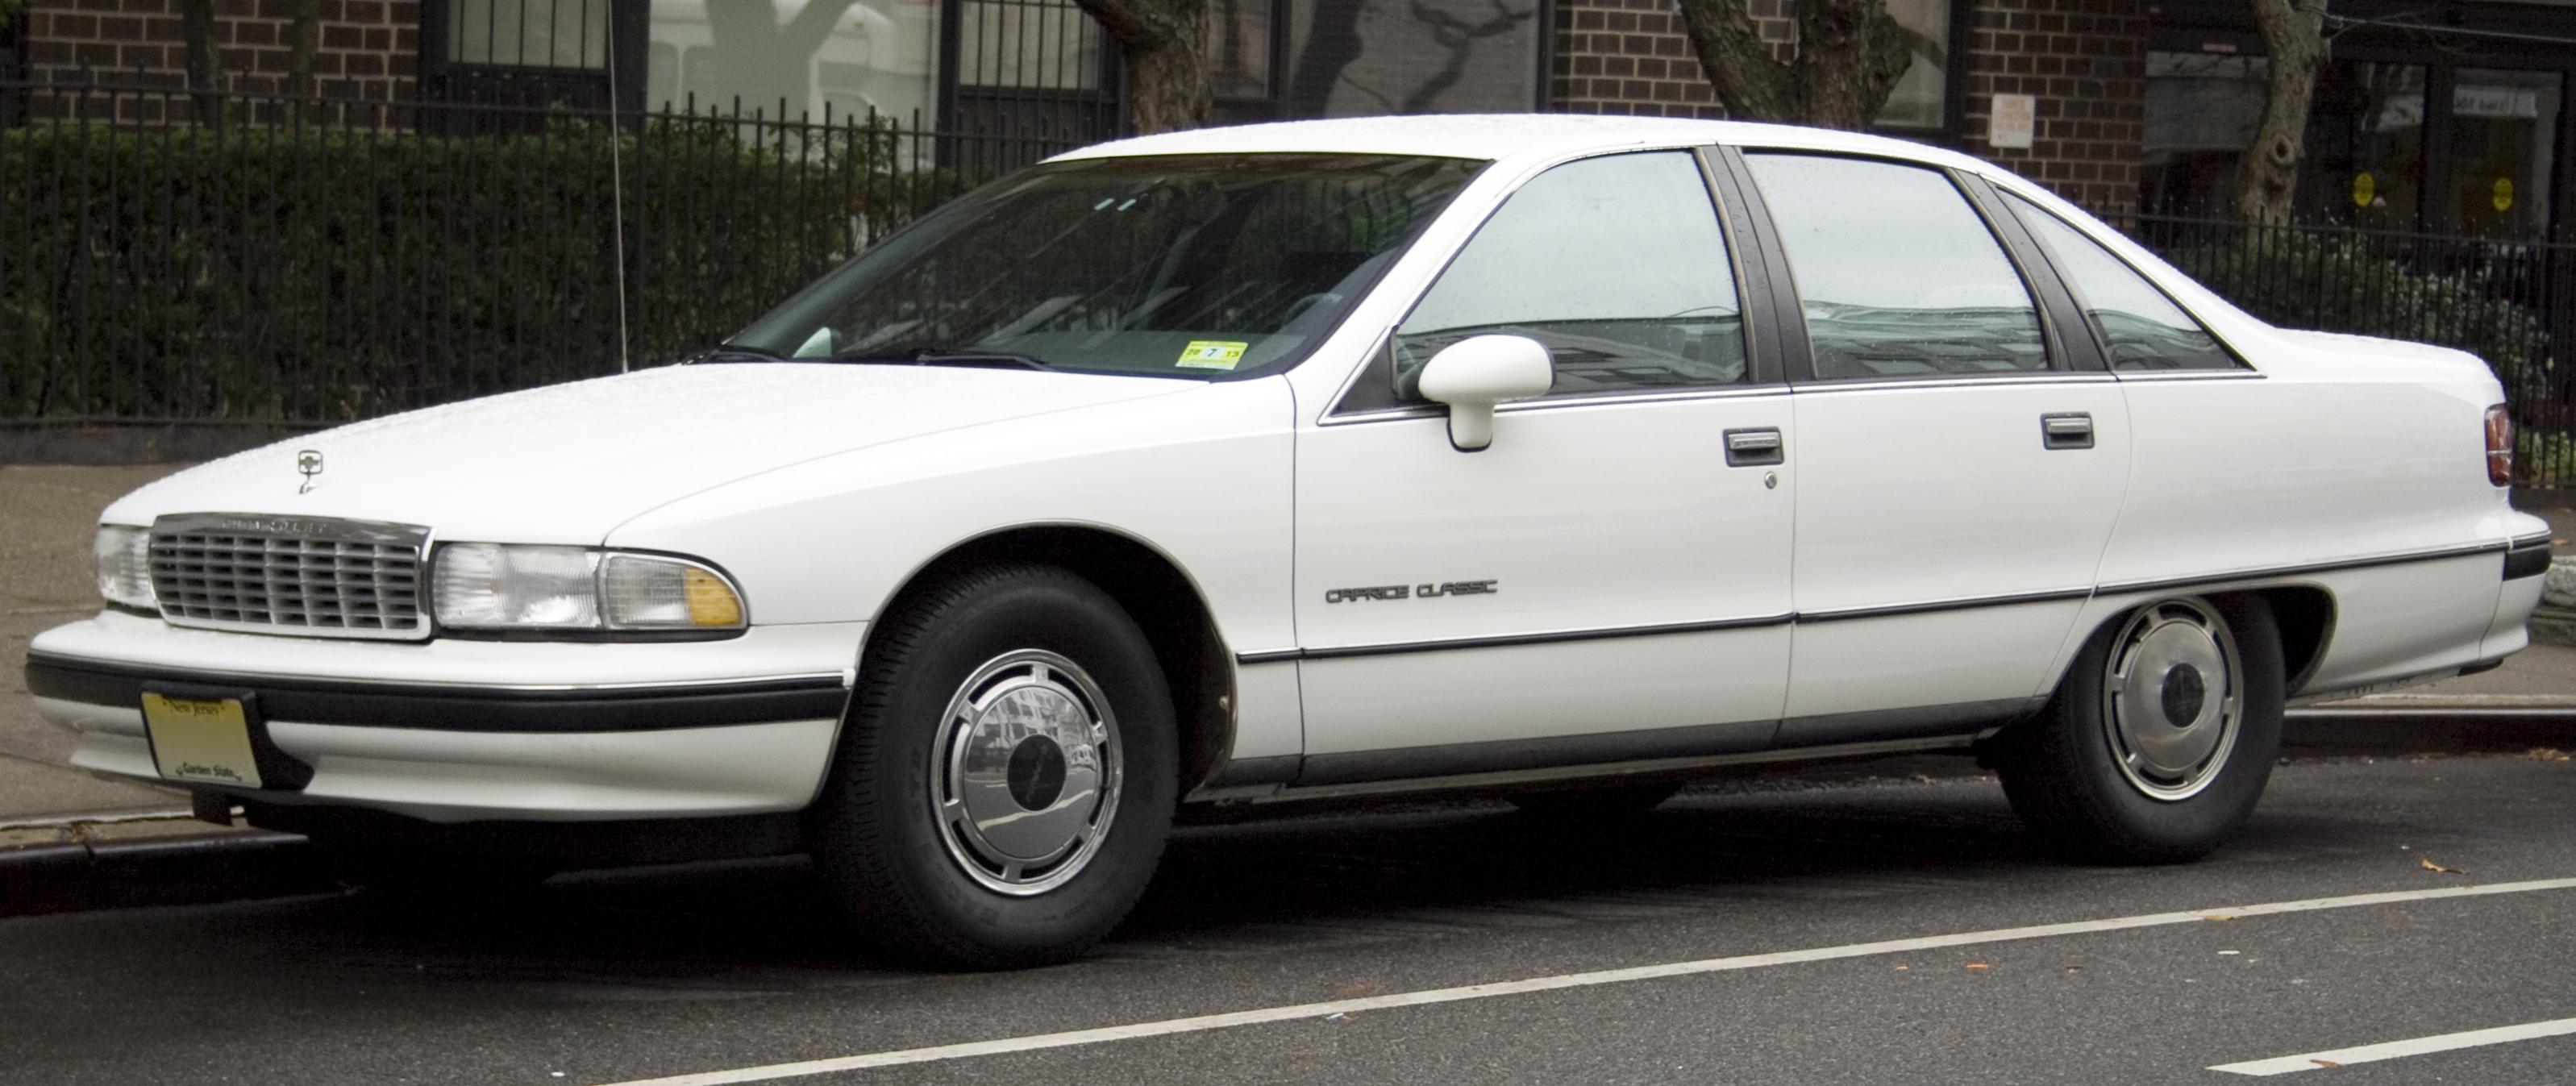 1991 Chevrolet Caprice Classic Joel Reyes Noche